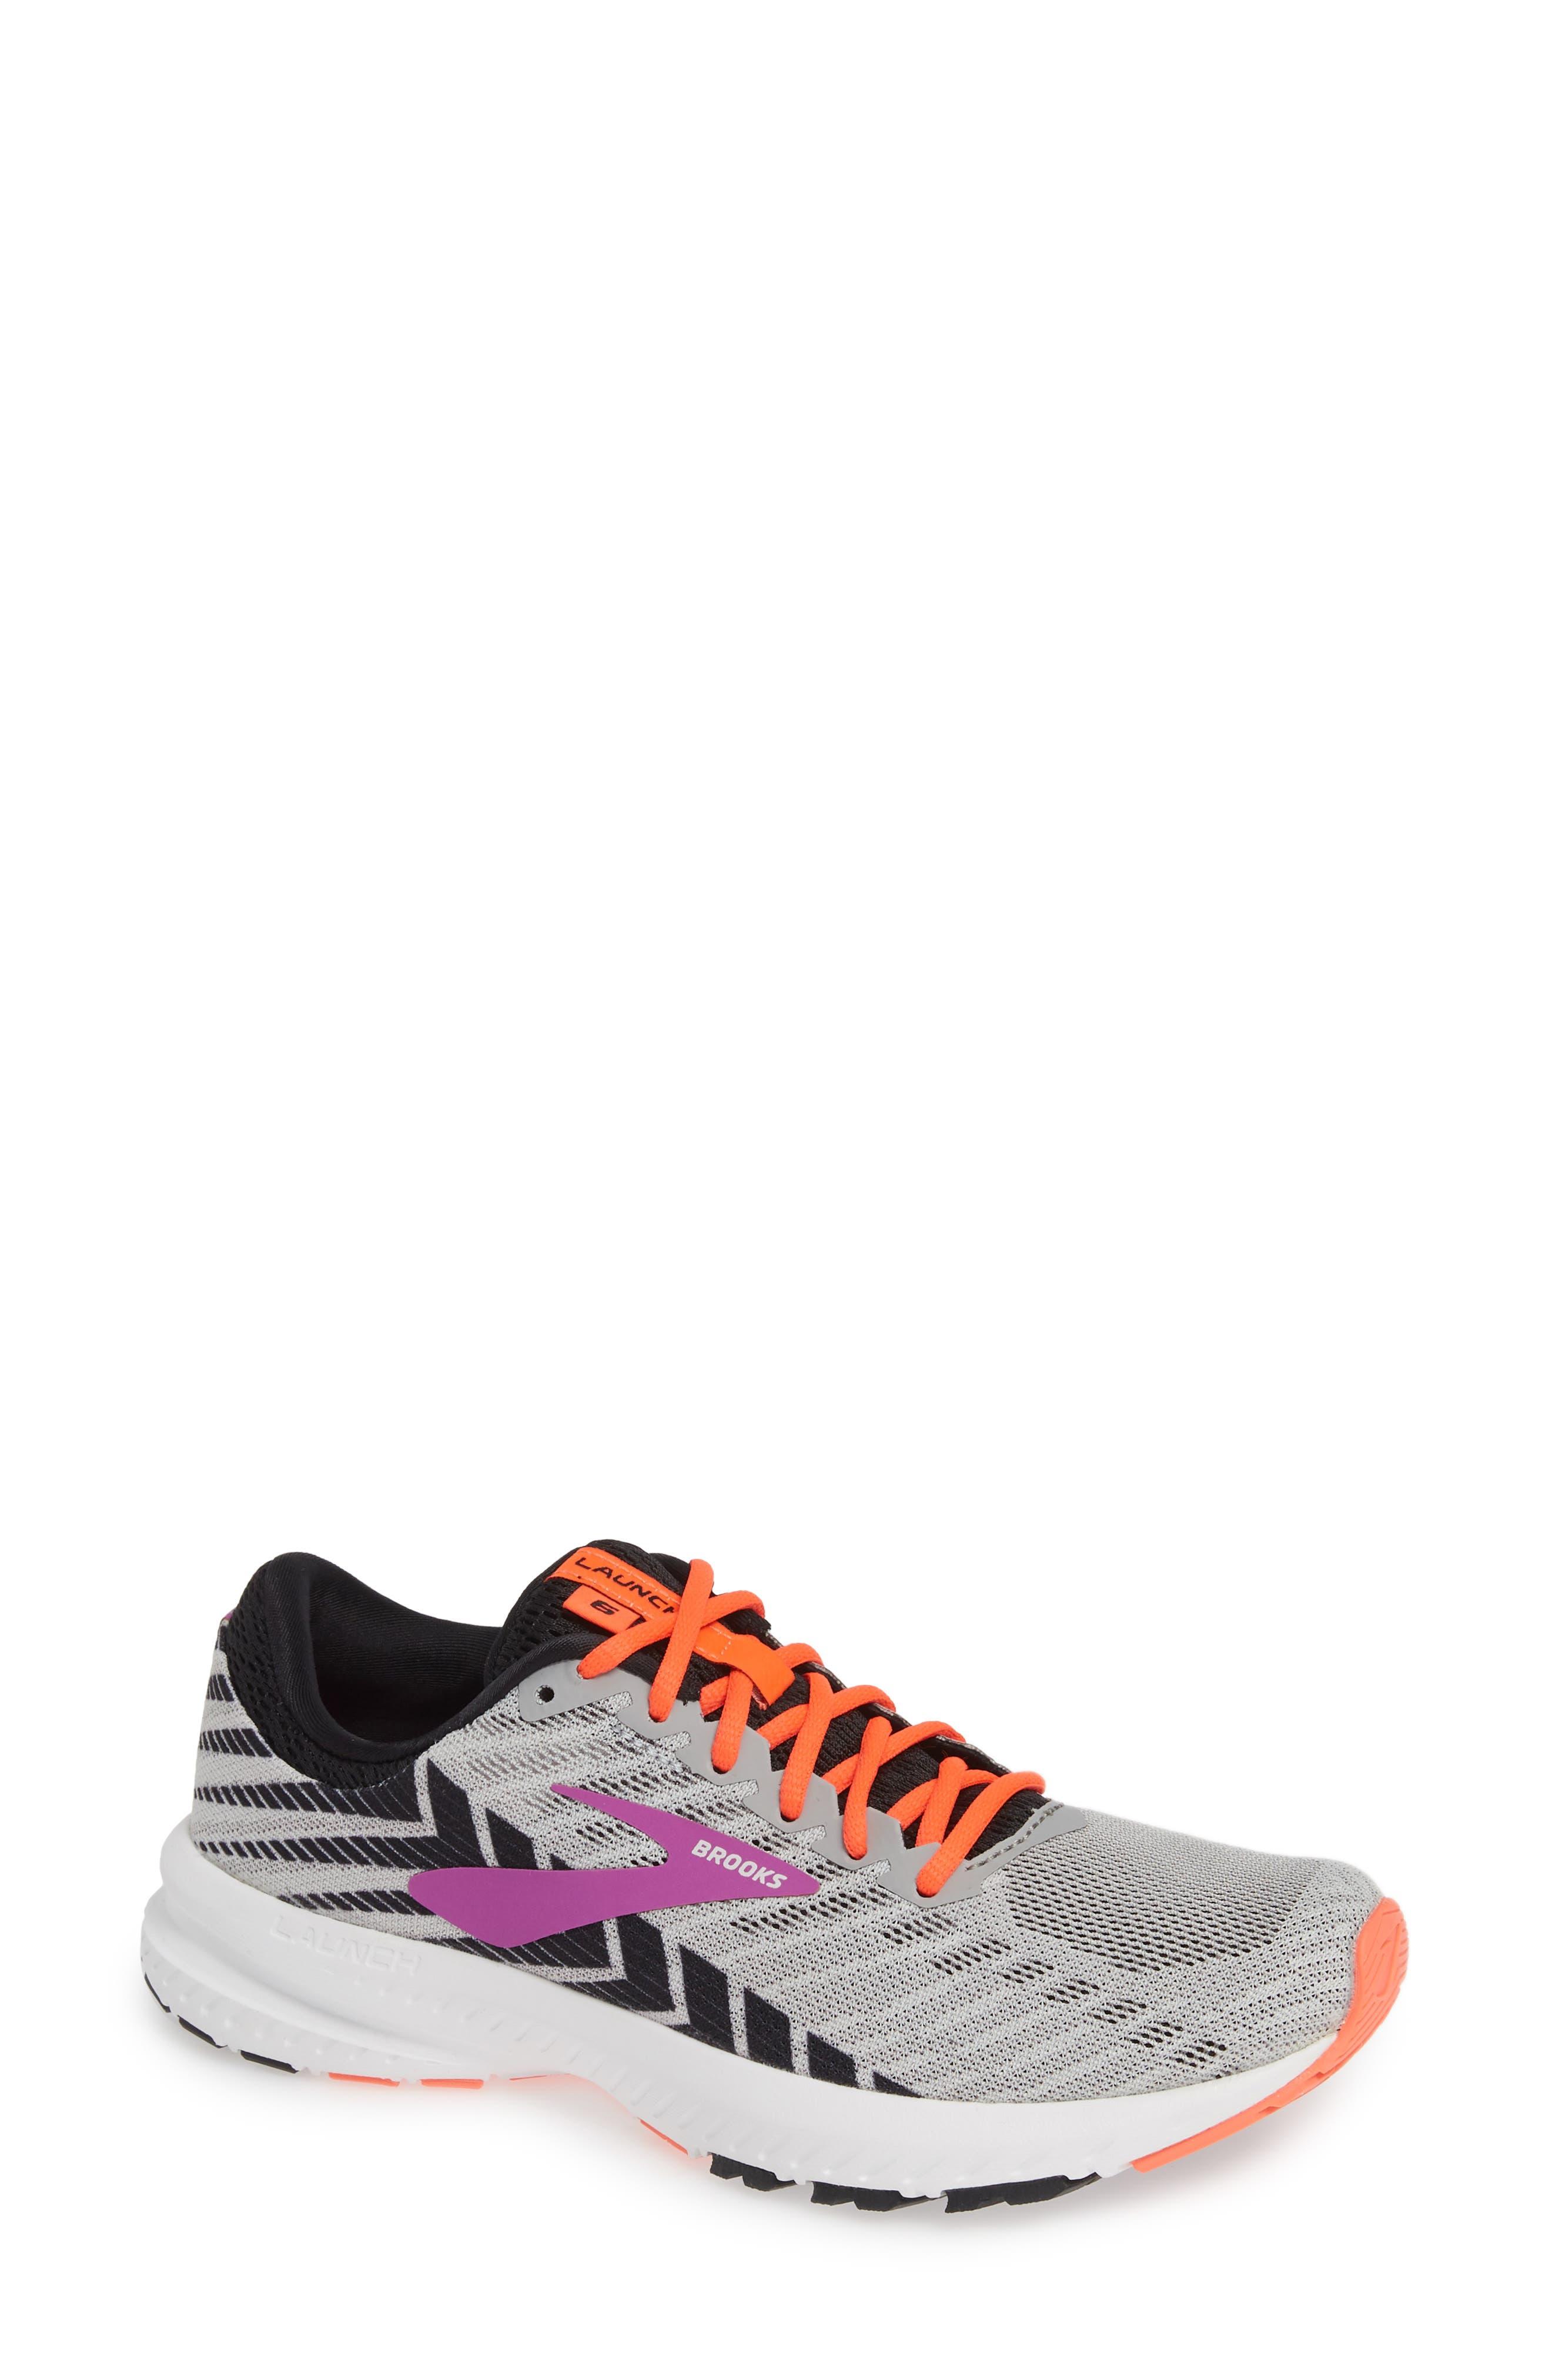 Brooks Launch 6 Running Shoe, Grey